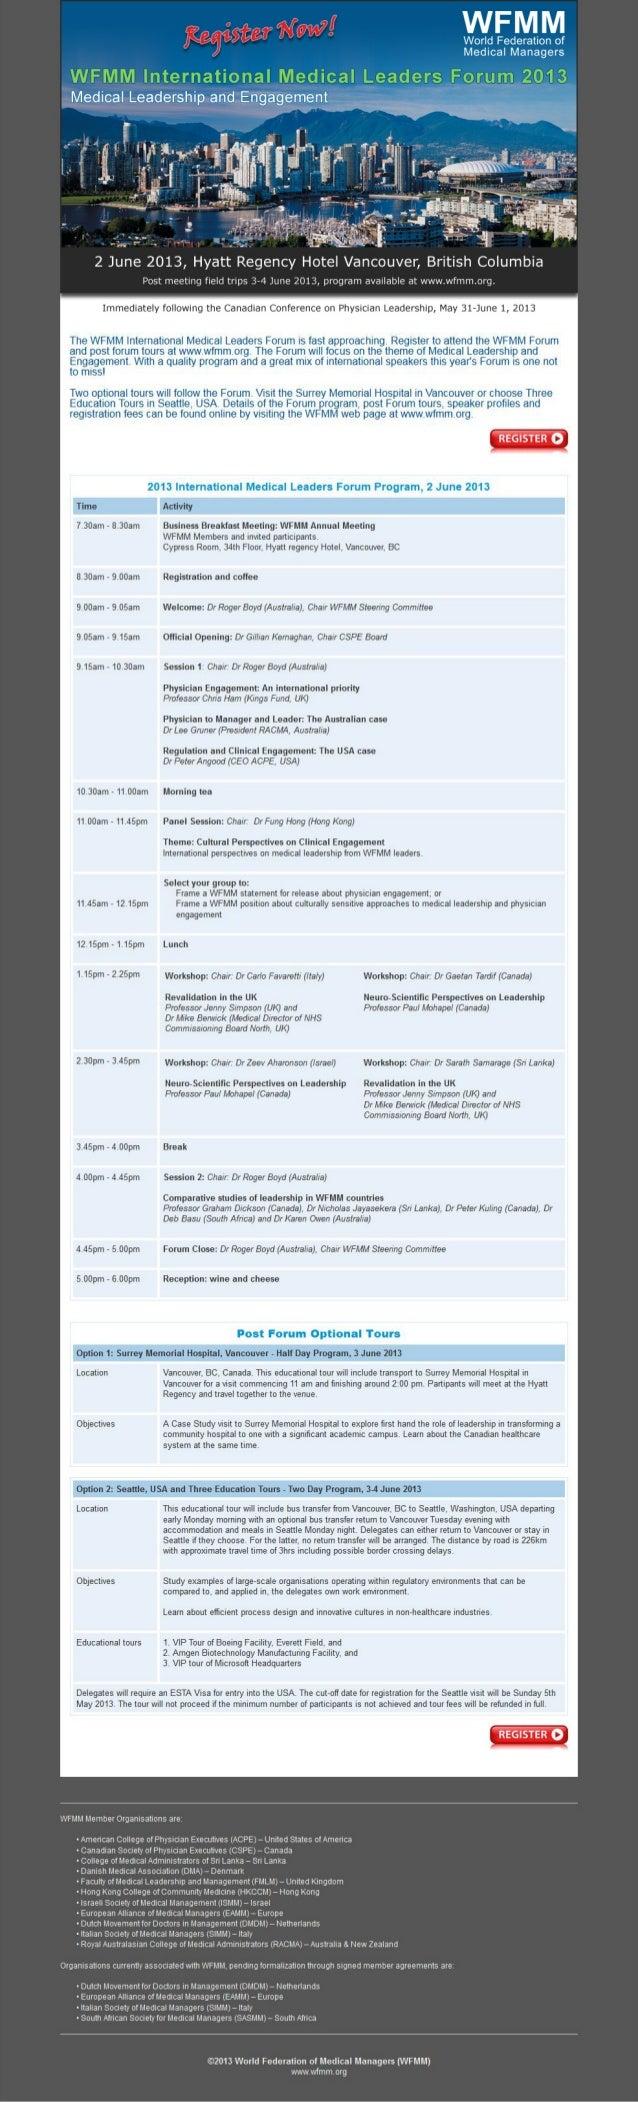 Wfmm international medical leaders forum 2013